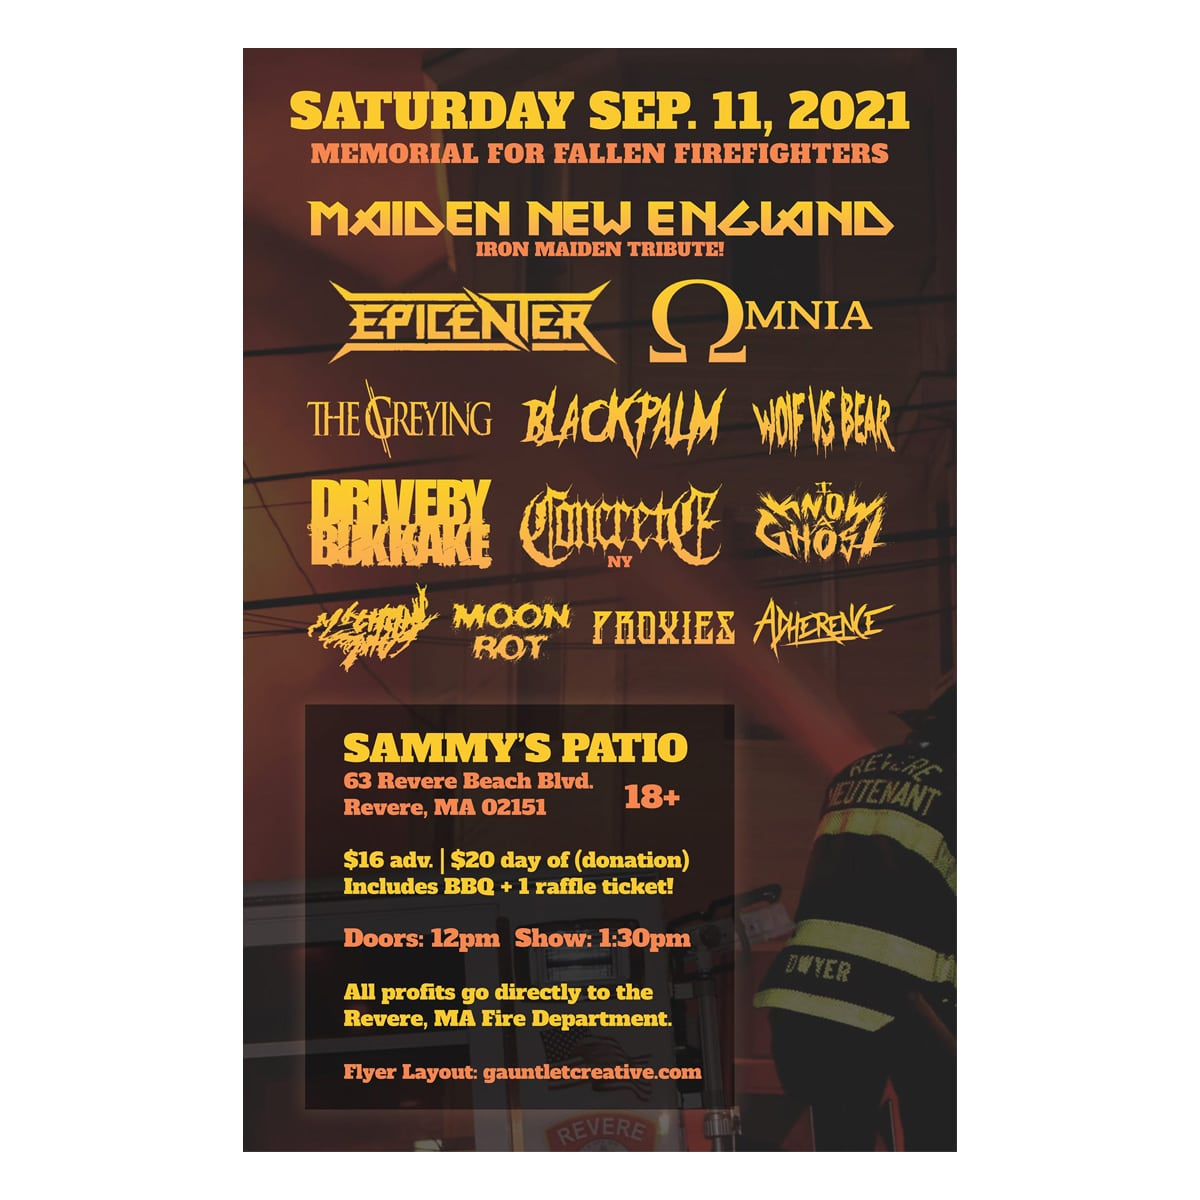 Sammy's Patio Fallen Firefighter Memorial Show Maiden New England Drive-By Bukkake Epicenter Sammy's Patio September 11 2021